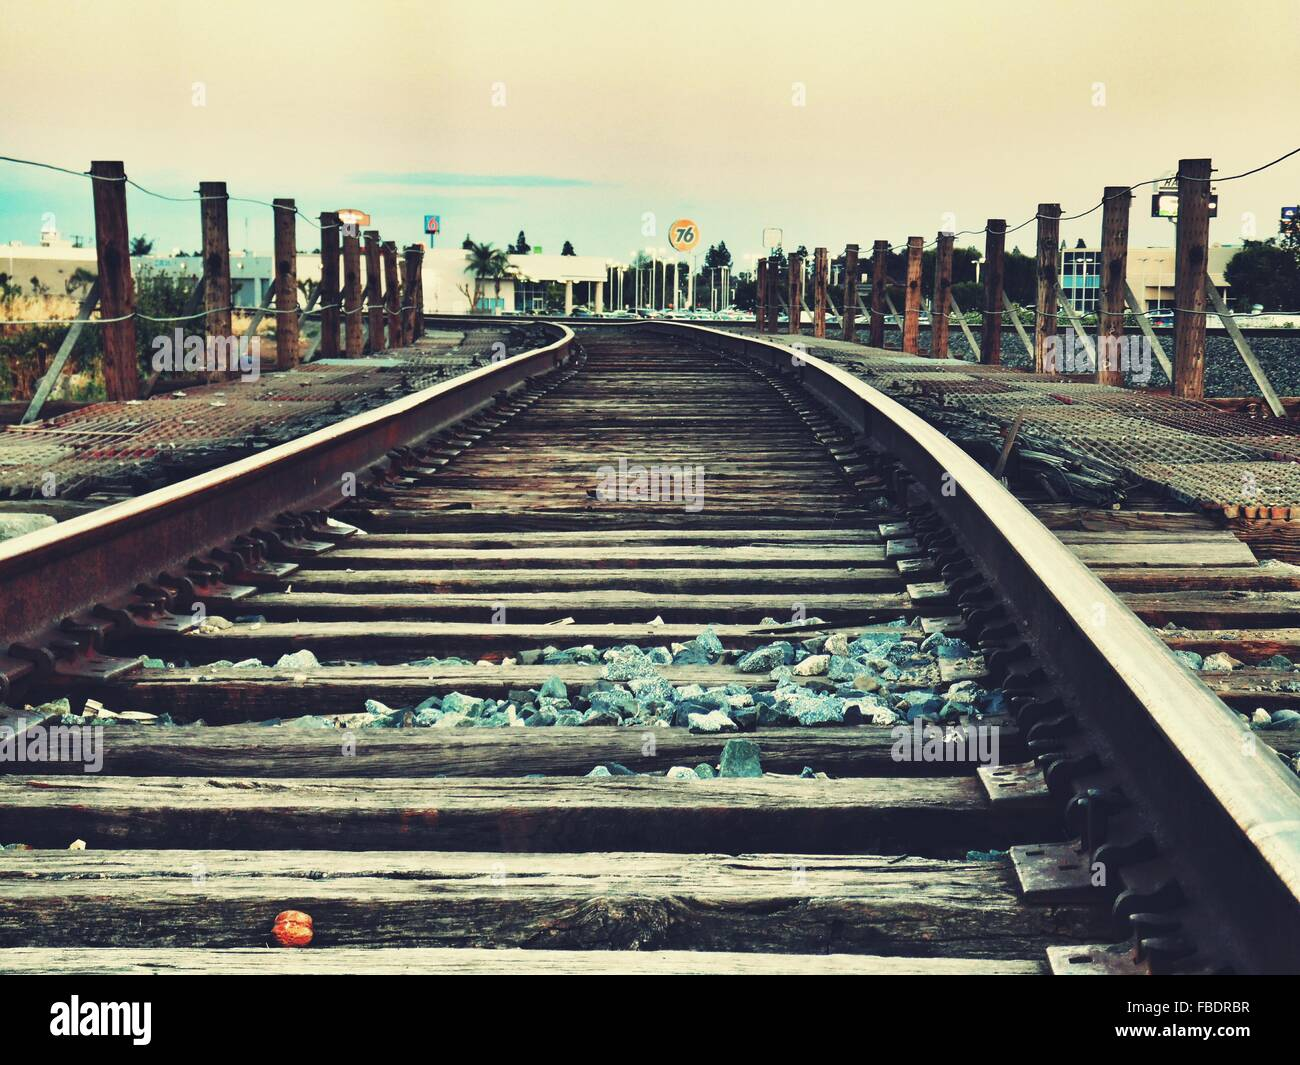 Surface Level Of Railway Tracks Against Sky - Stock Image